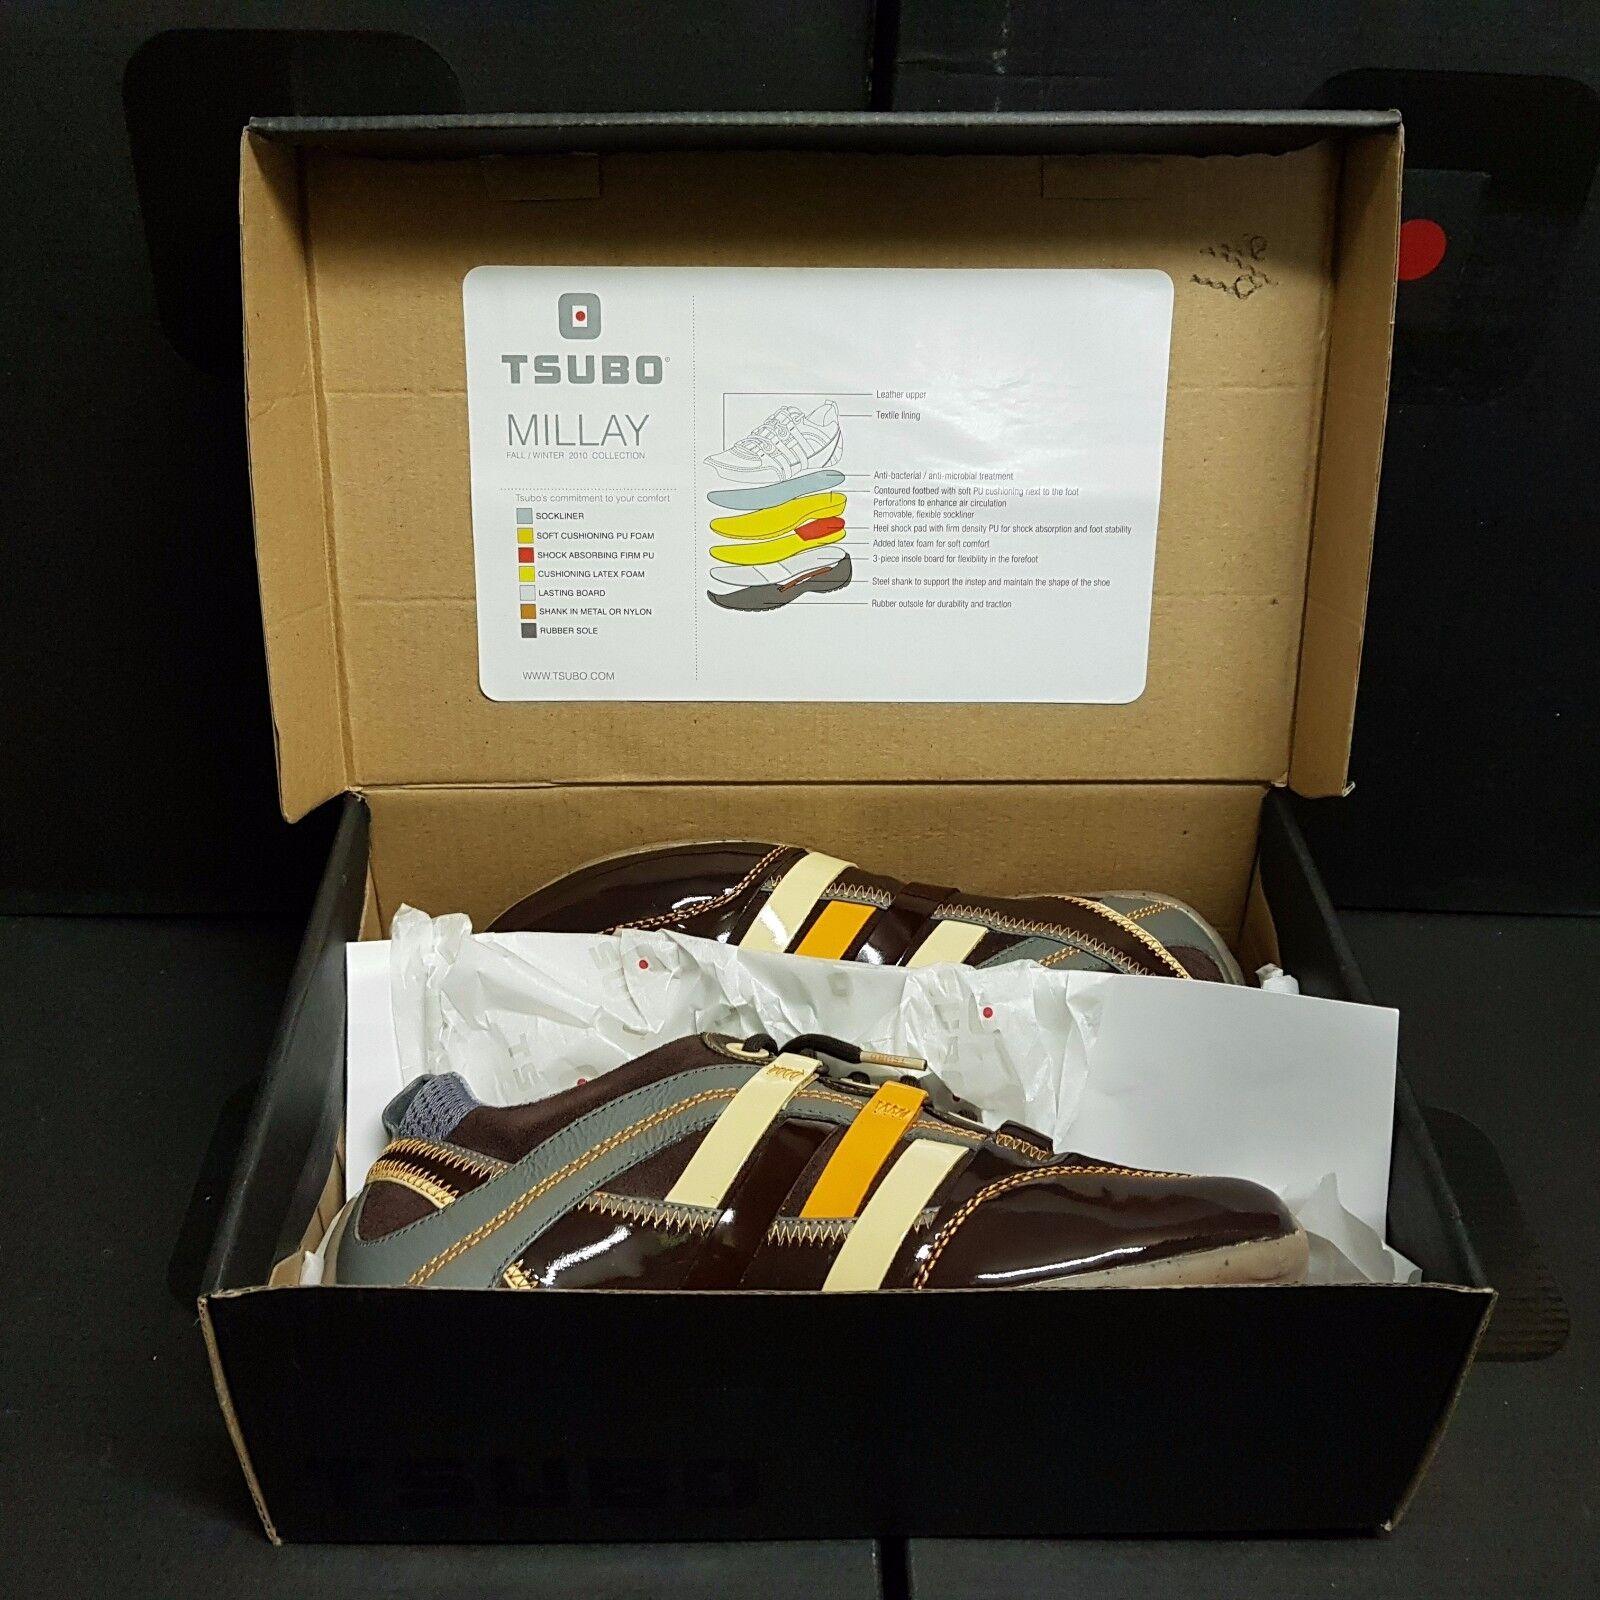 TSUBO Millay uomo donna scarpe scarpe scarpe da ginnastica leather scarpe US 7 EUR 38 (rrp ) | tender  9d520d